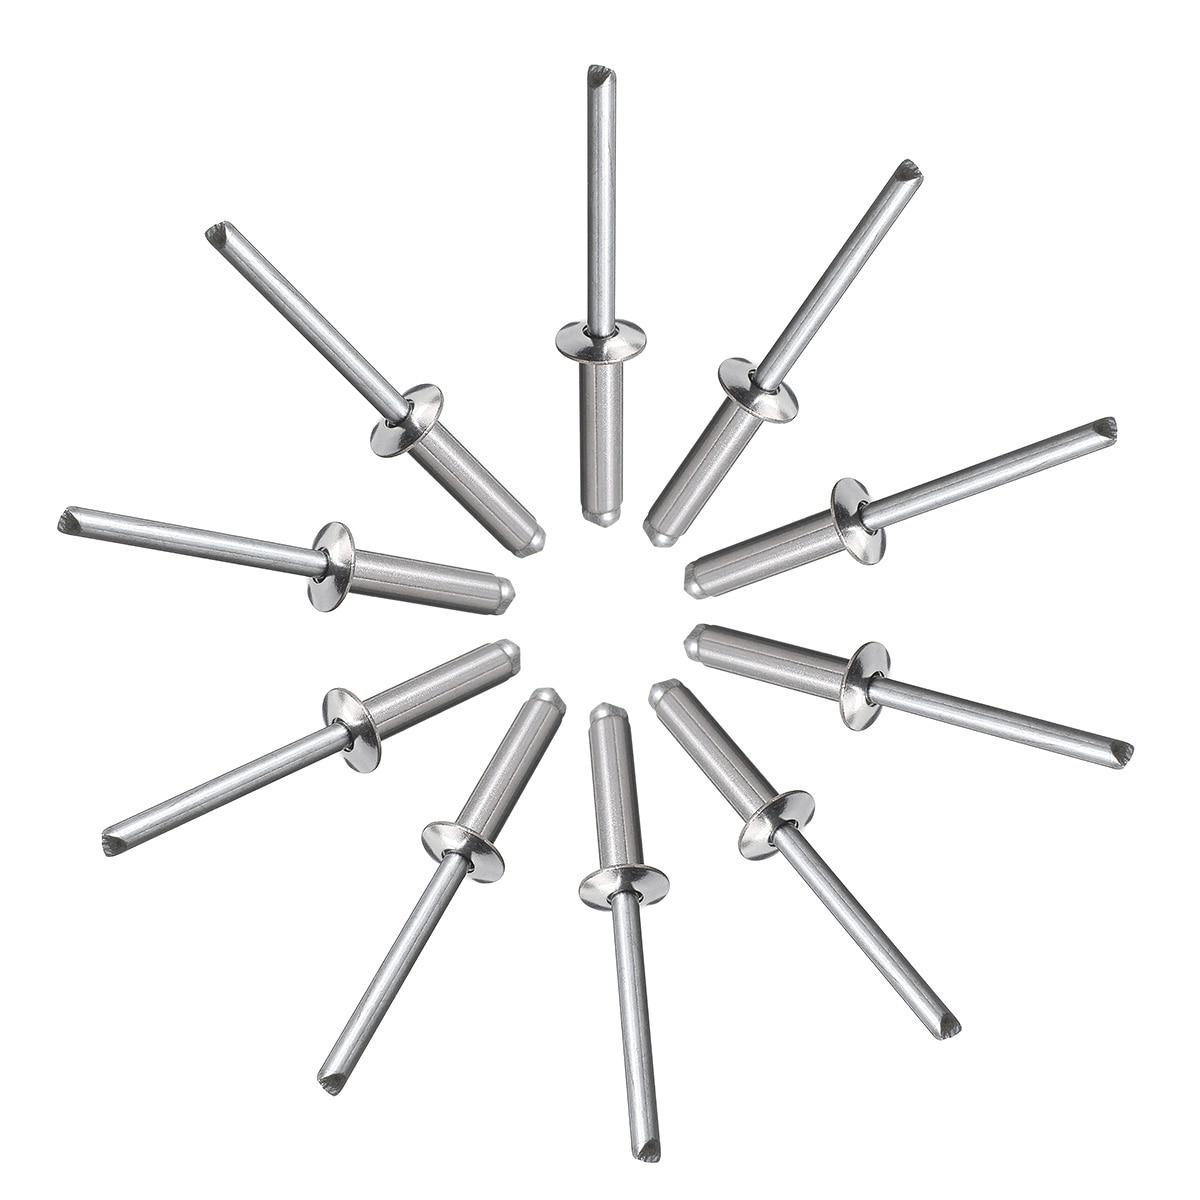 100pcs Set M5 Stainless Steel Blind Rivets Nail Decoration Pop